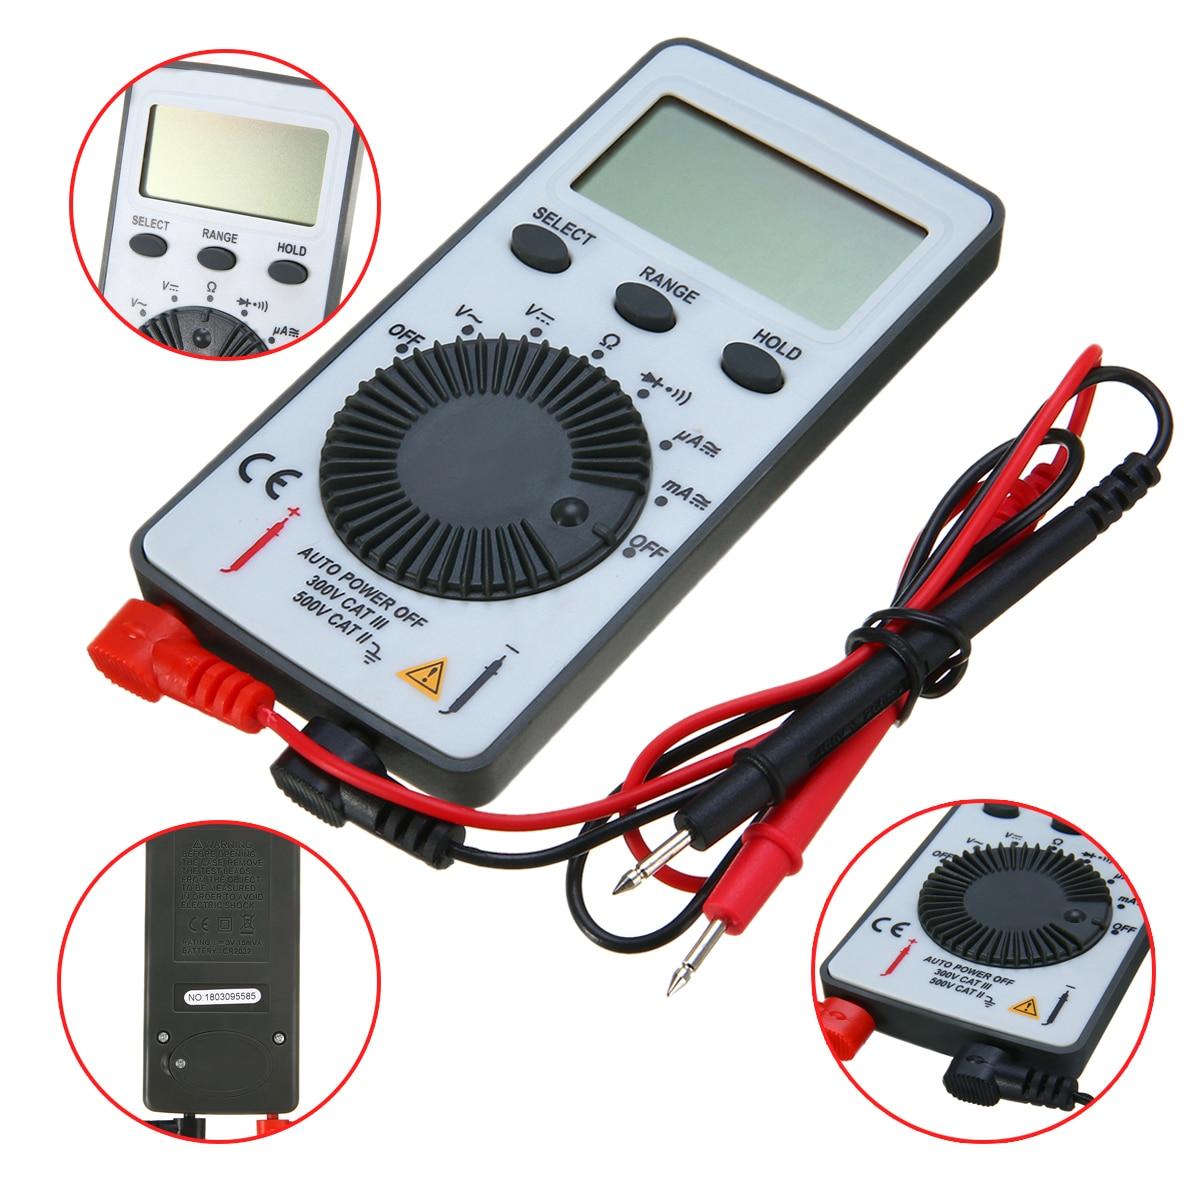 An101 digital mini multímetro dc/ac tensão medidor de corrente handheld bolso voltímetro amperímetro tester com teste leva 10*55*10mm